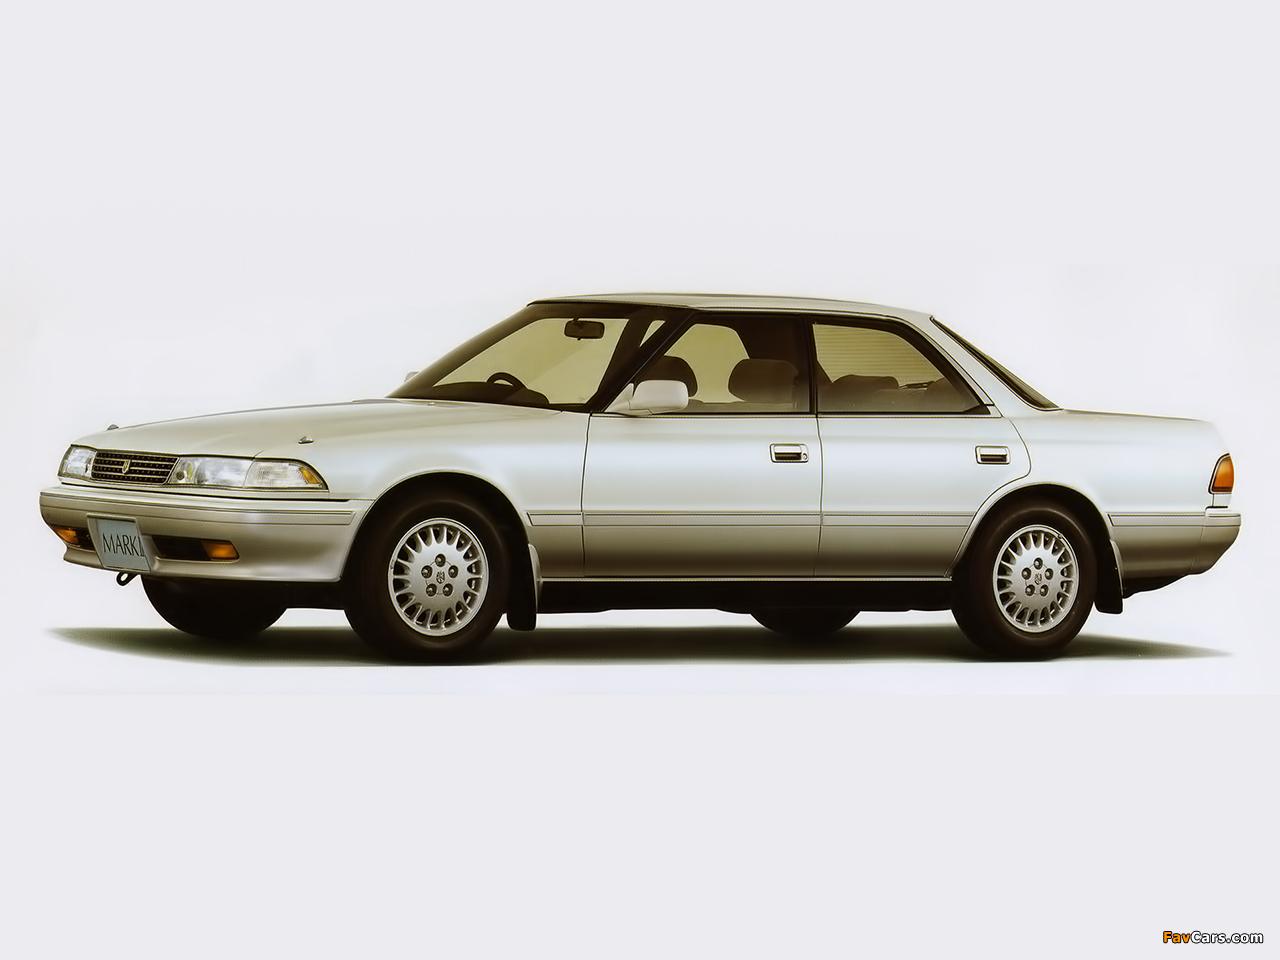 Photos Of Toyota Mark Ii Grande Twin Cam 24 Gx81 1989 92